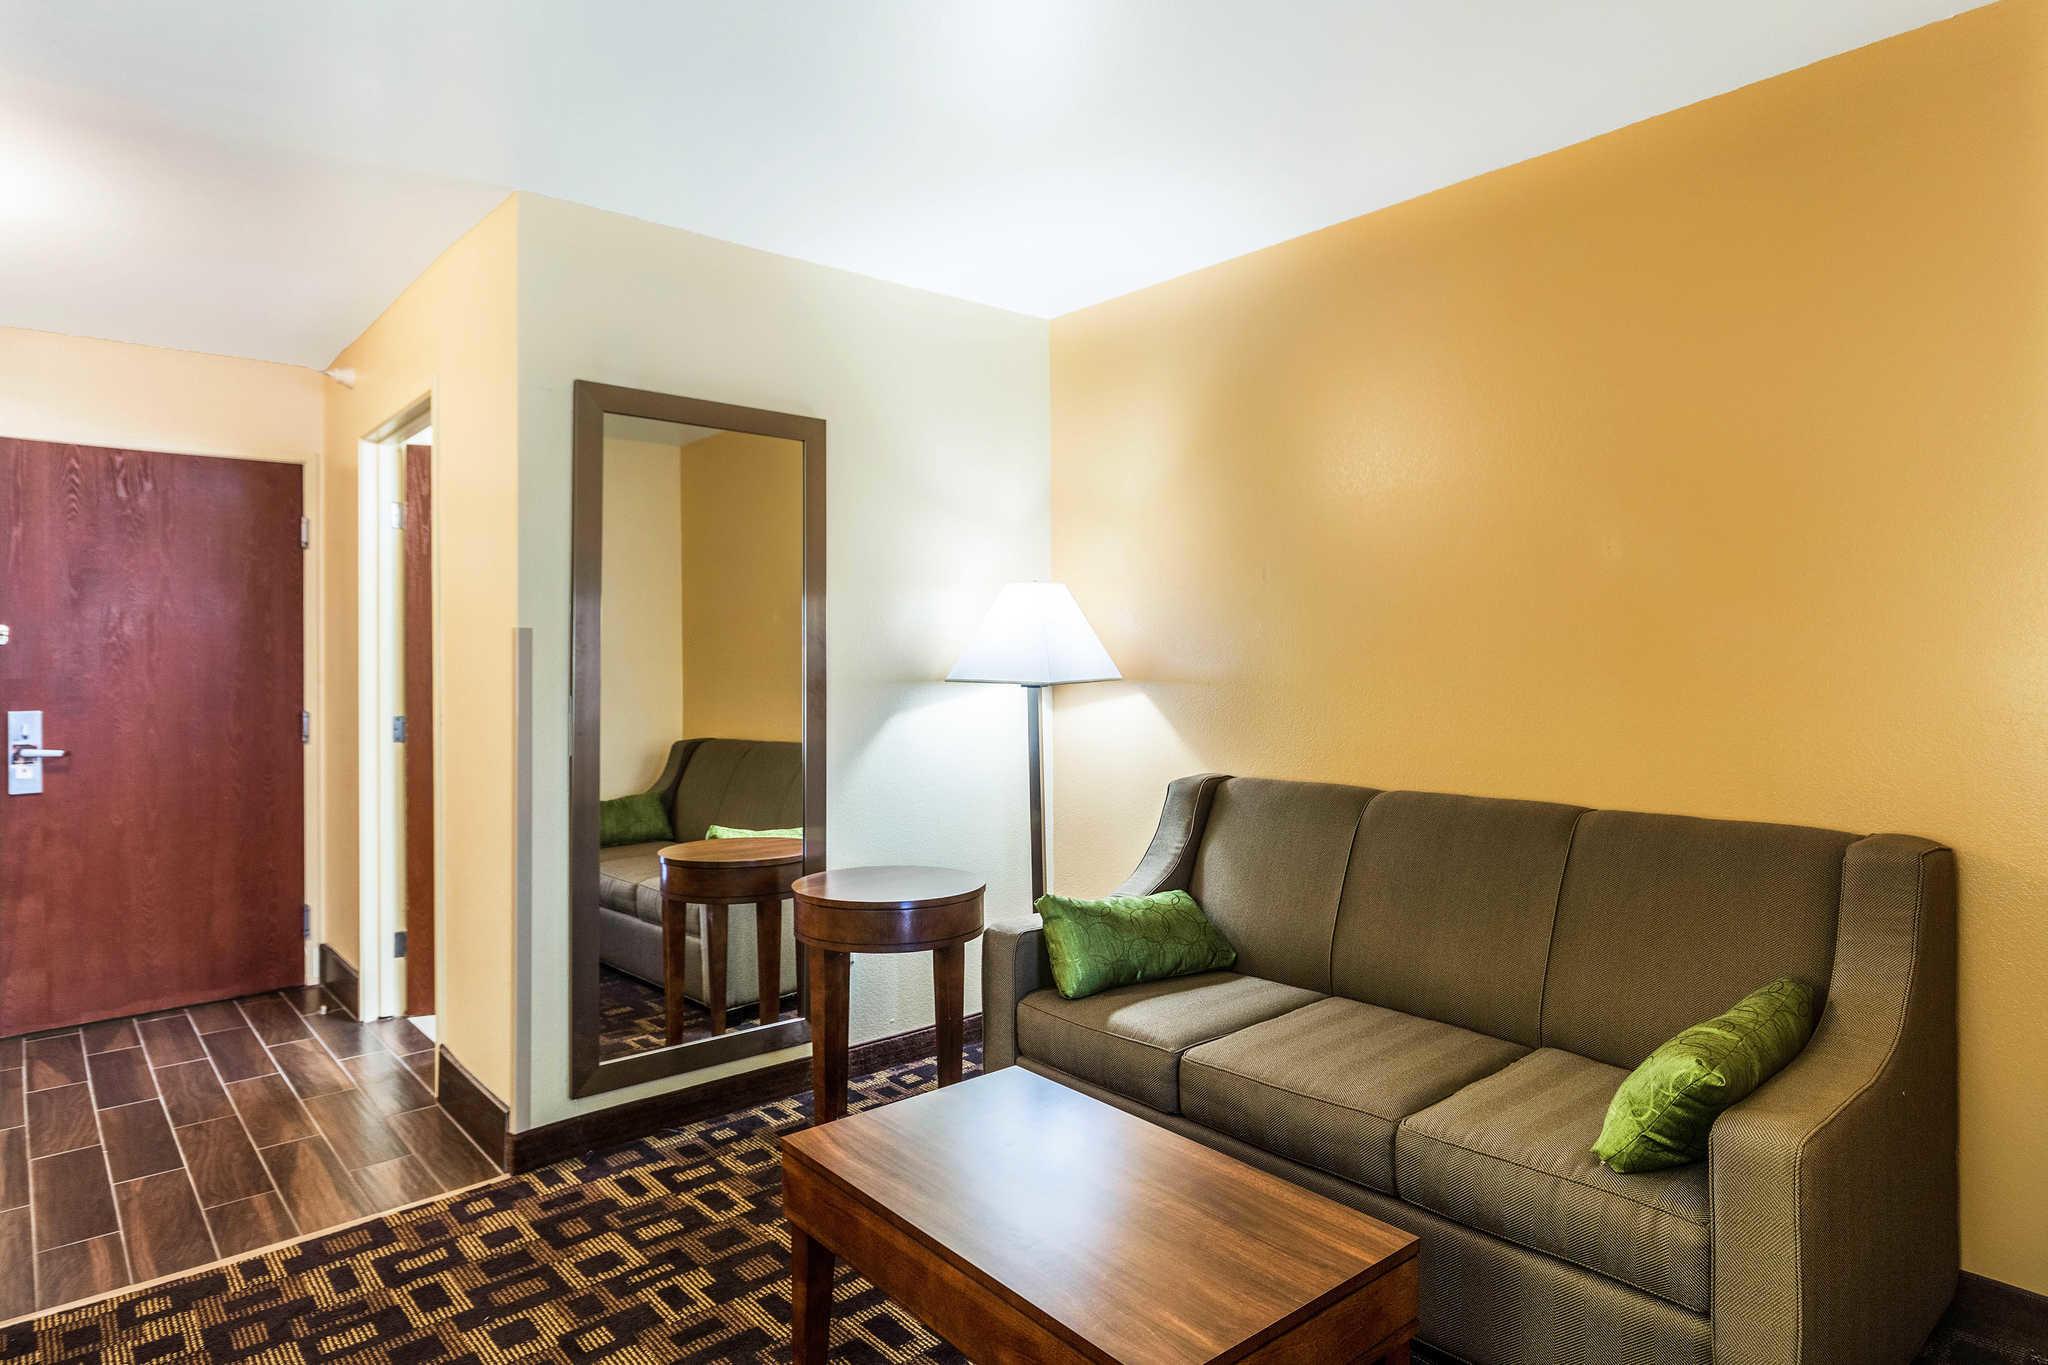 Comfort Inn & Suites North Aurora - Naperville image 23